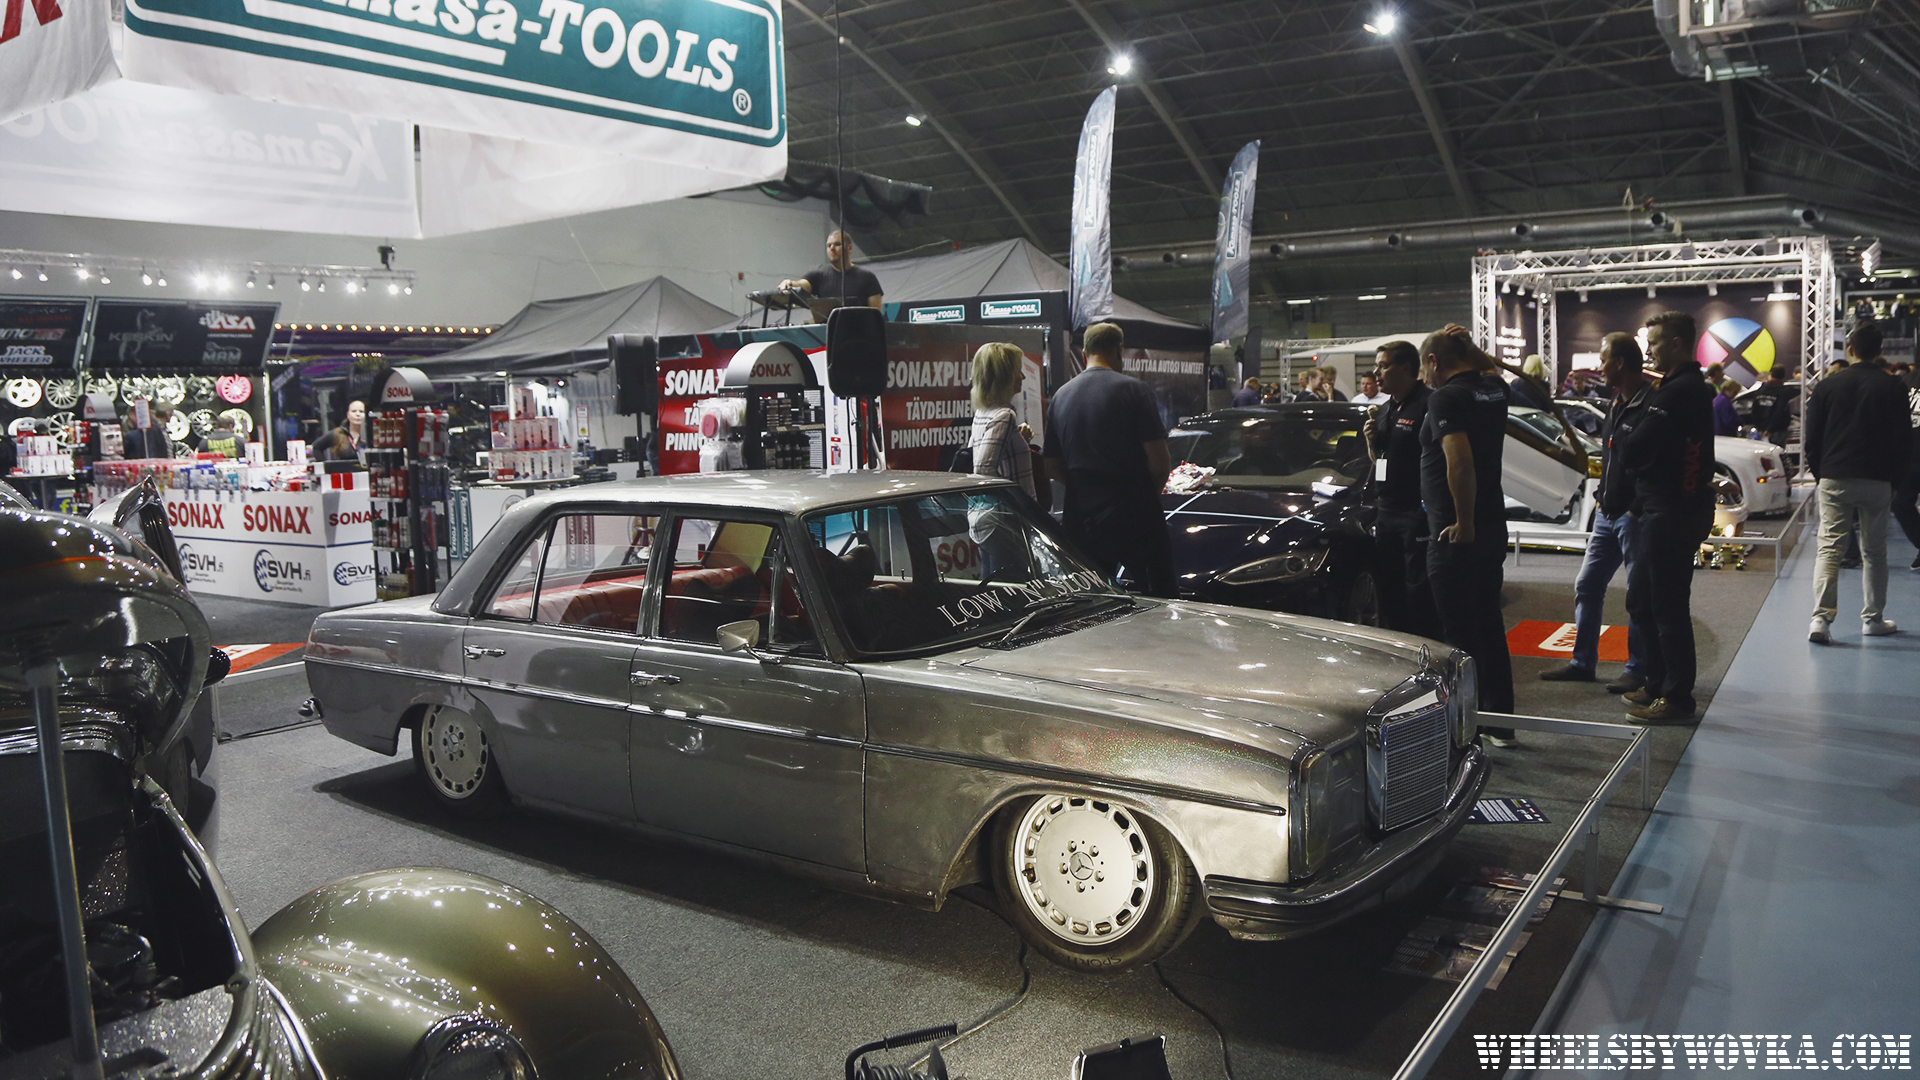 x-treme-car-show-lahti-2017-1